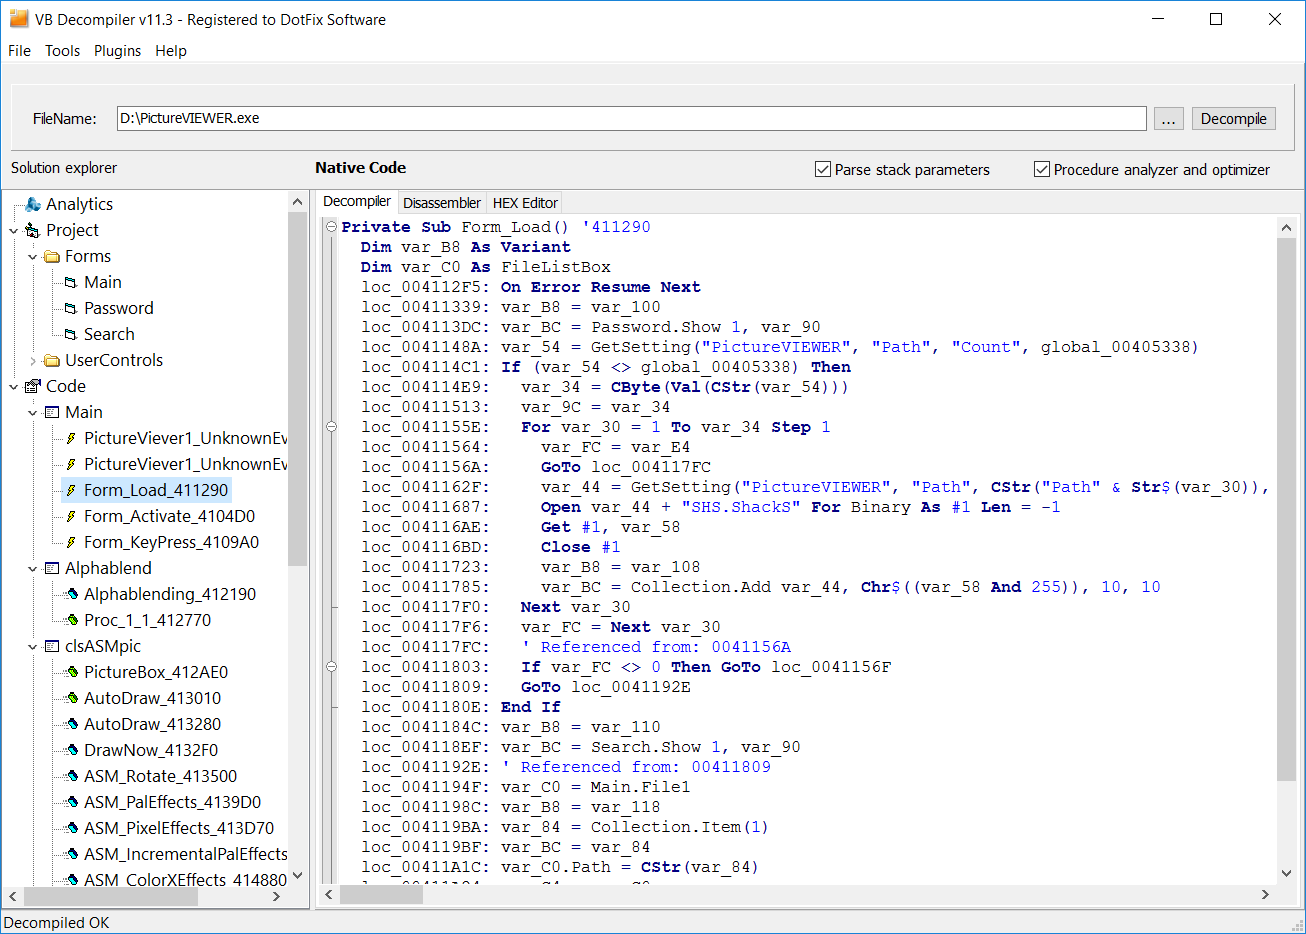 ... for programs (EXE, DLL or OCX) Visual Basic 5.0 , 6.0 or .NET: http://dotfixsoft.com/vb_decompiler.htm